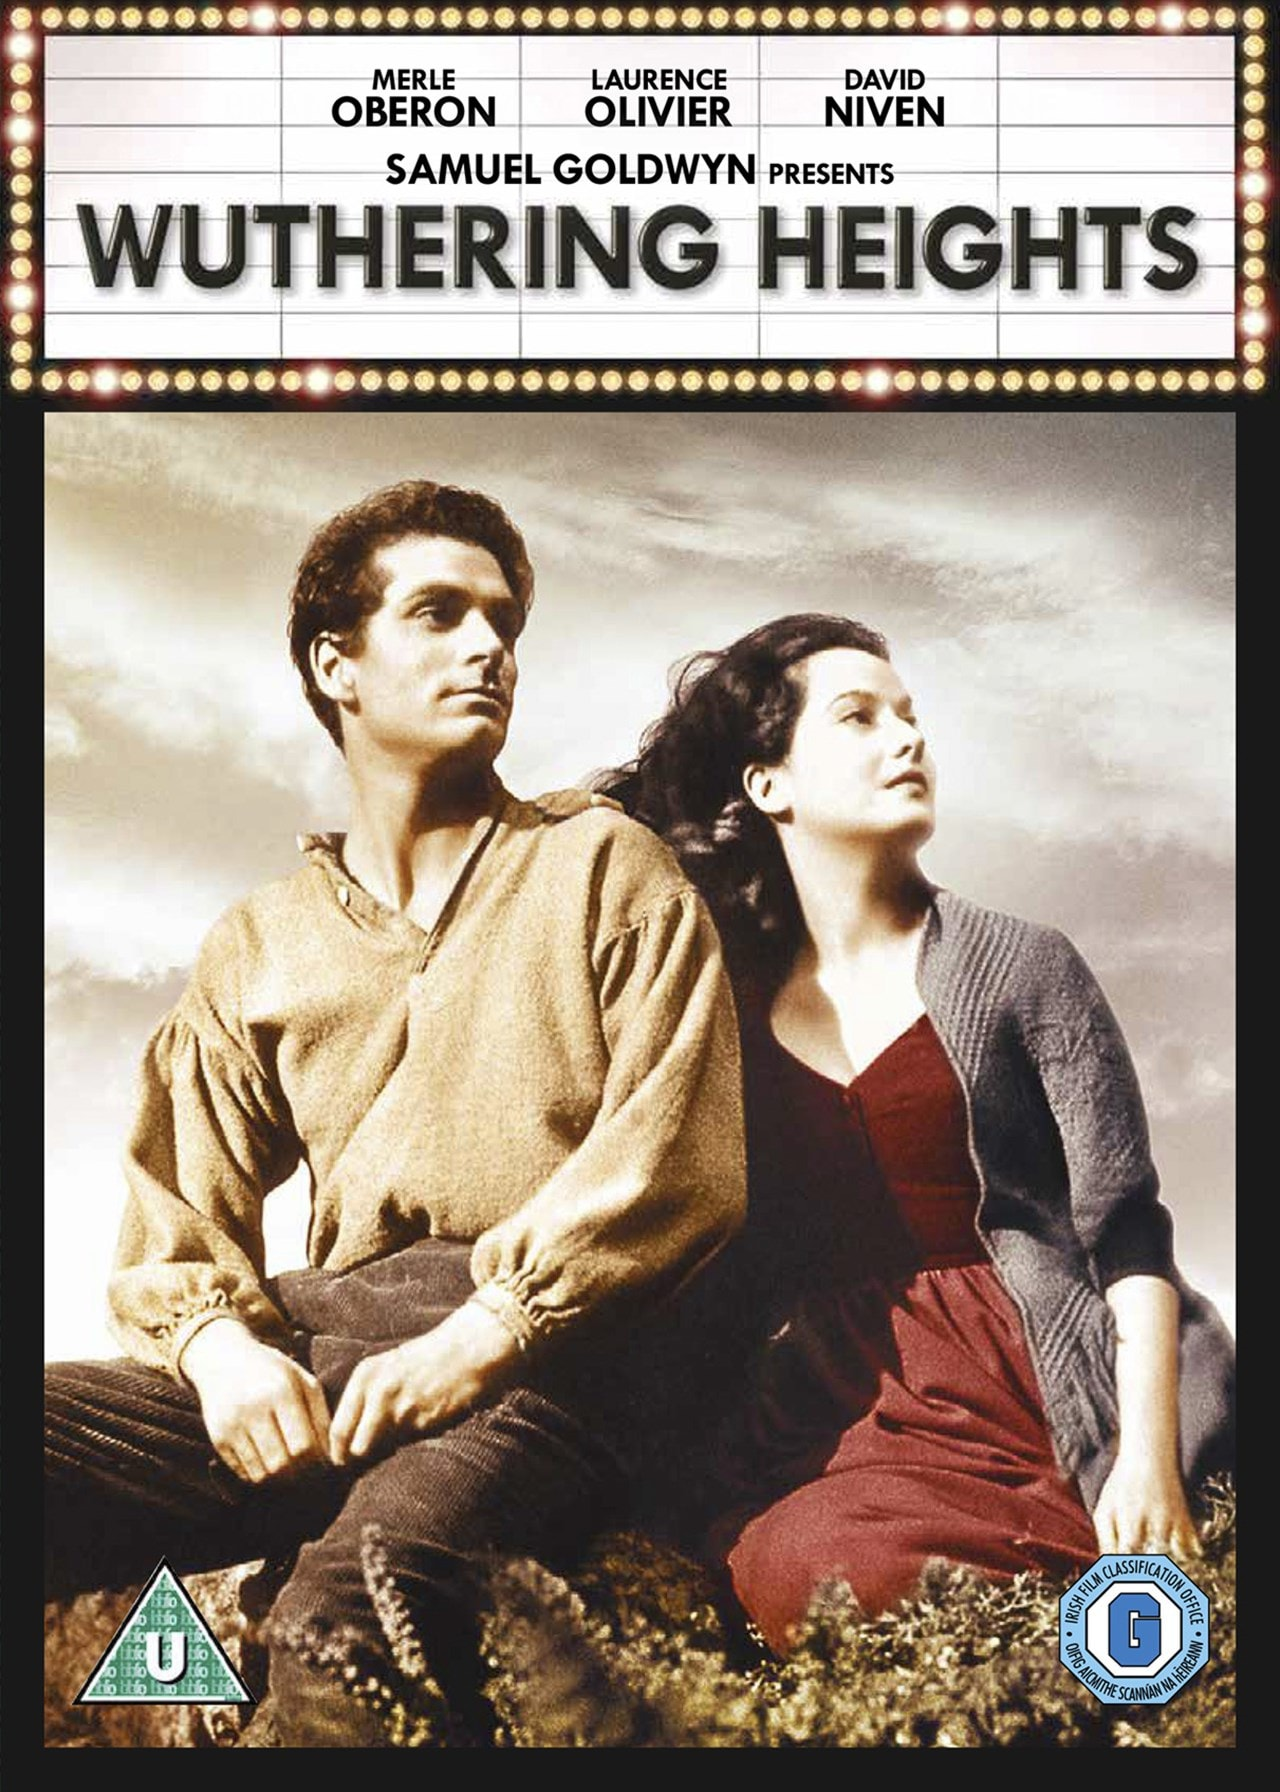 Wuthering Heights - Samuel Goldwyn Presents - 3